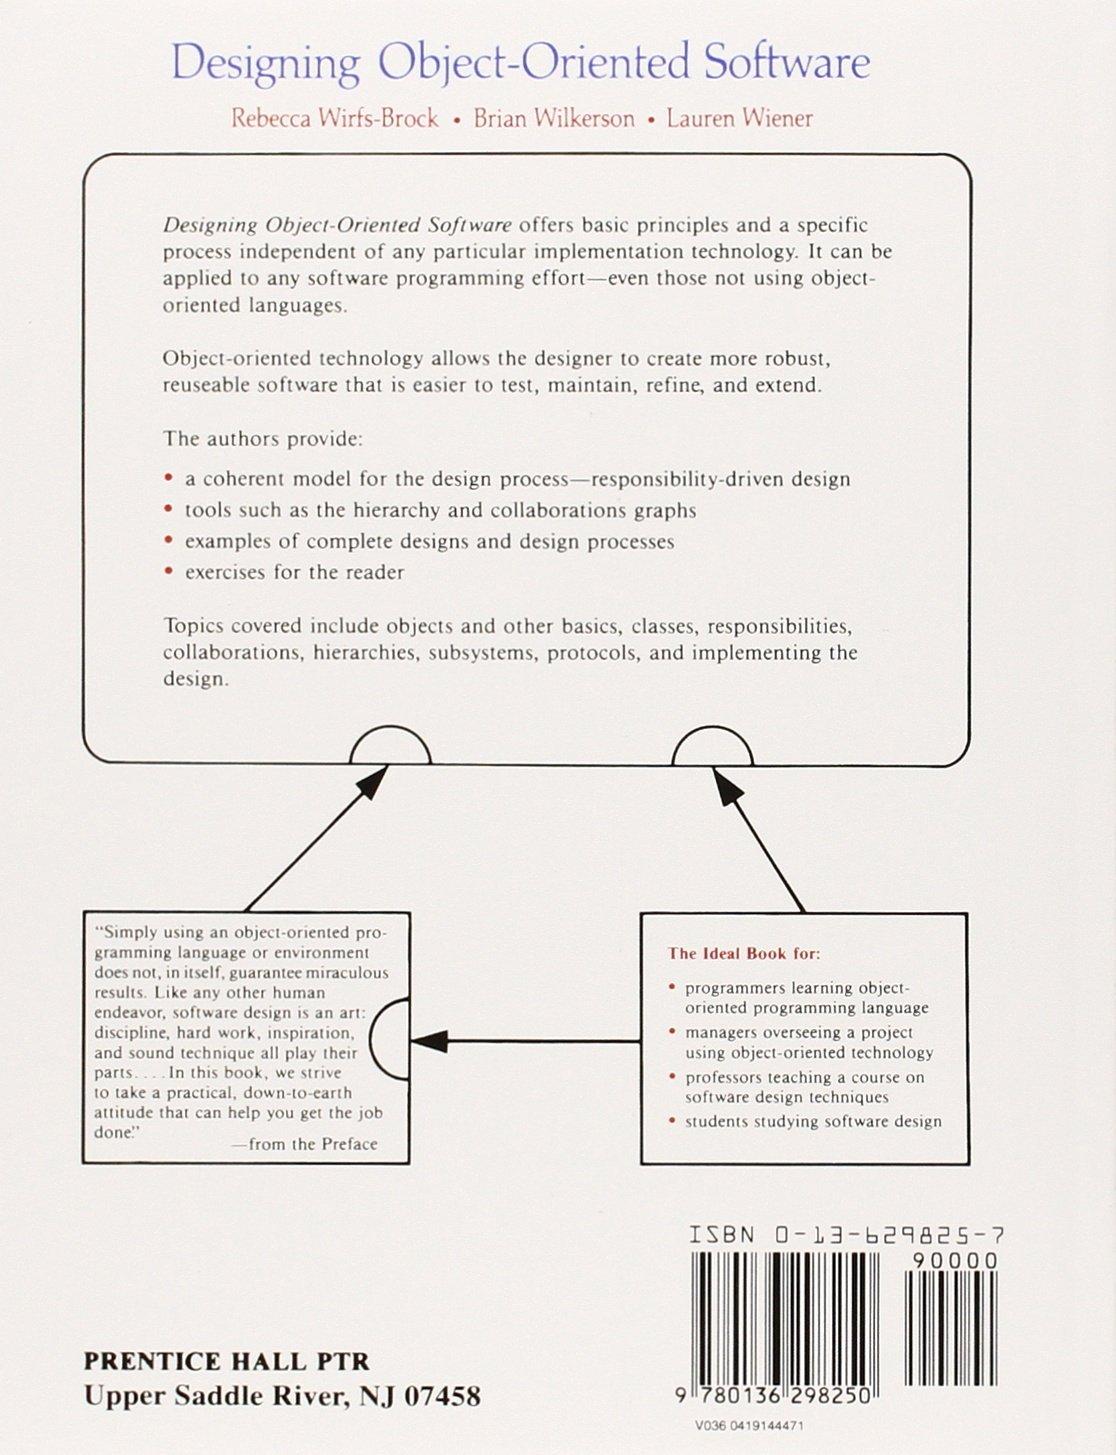 Designing object oriented software amazon rebecca wirfs brock designing object oriented software amazon rebecca wirfs brock brian wilkerson lauren wiener libros en idiomas extranjeros malvernweather Choice Image